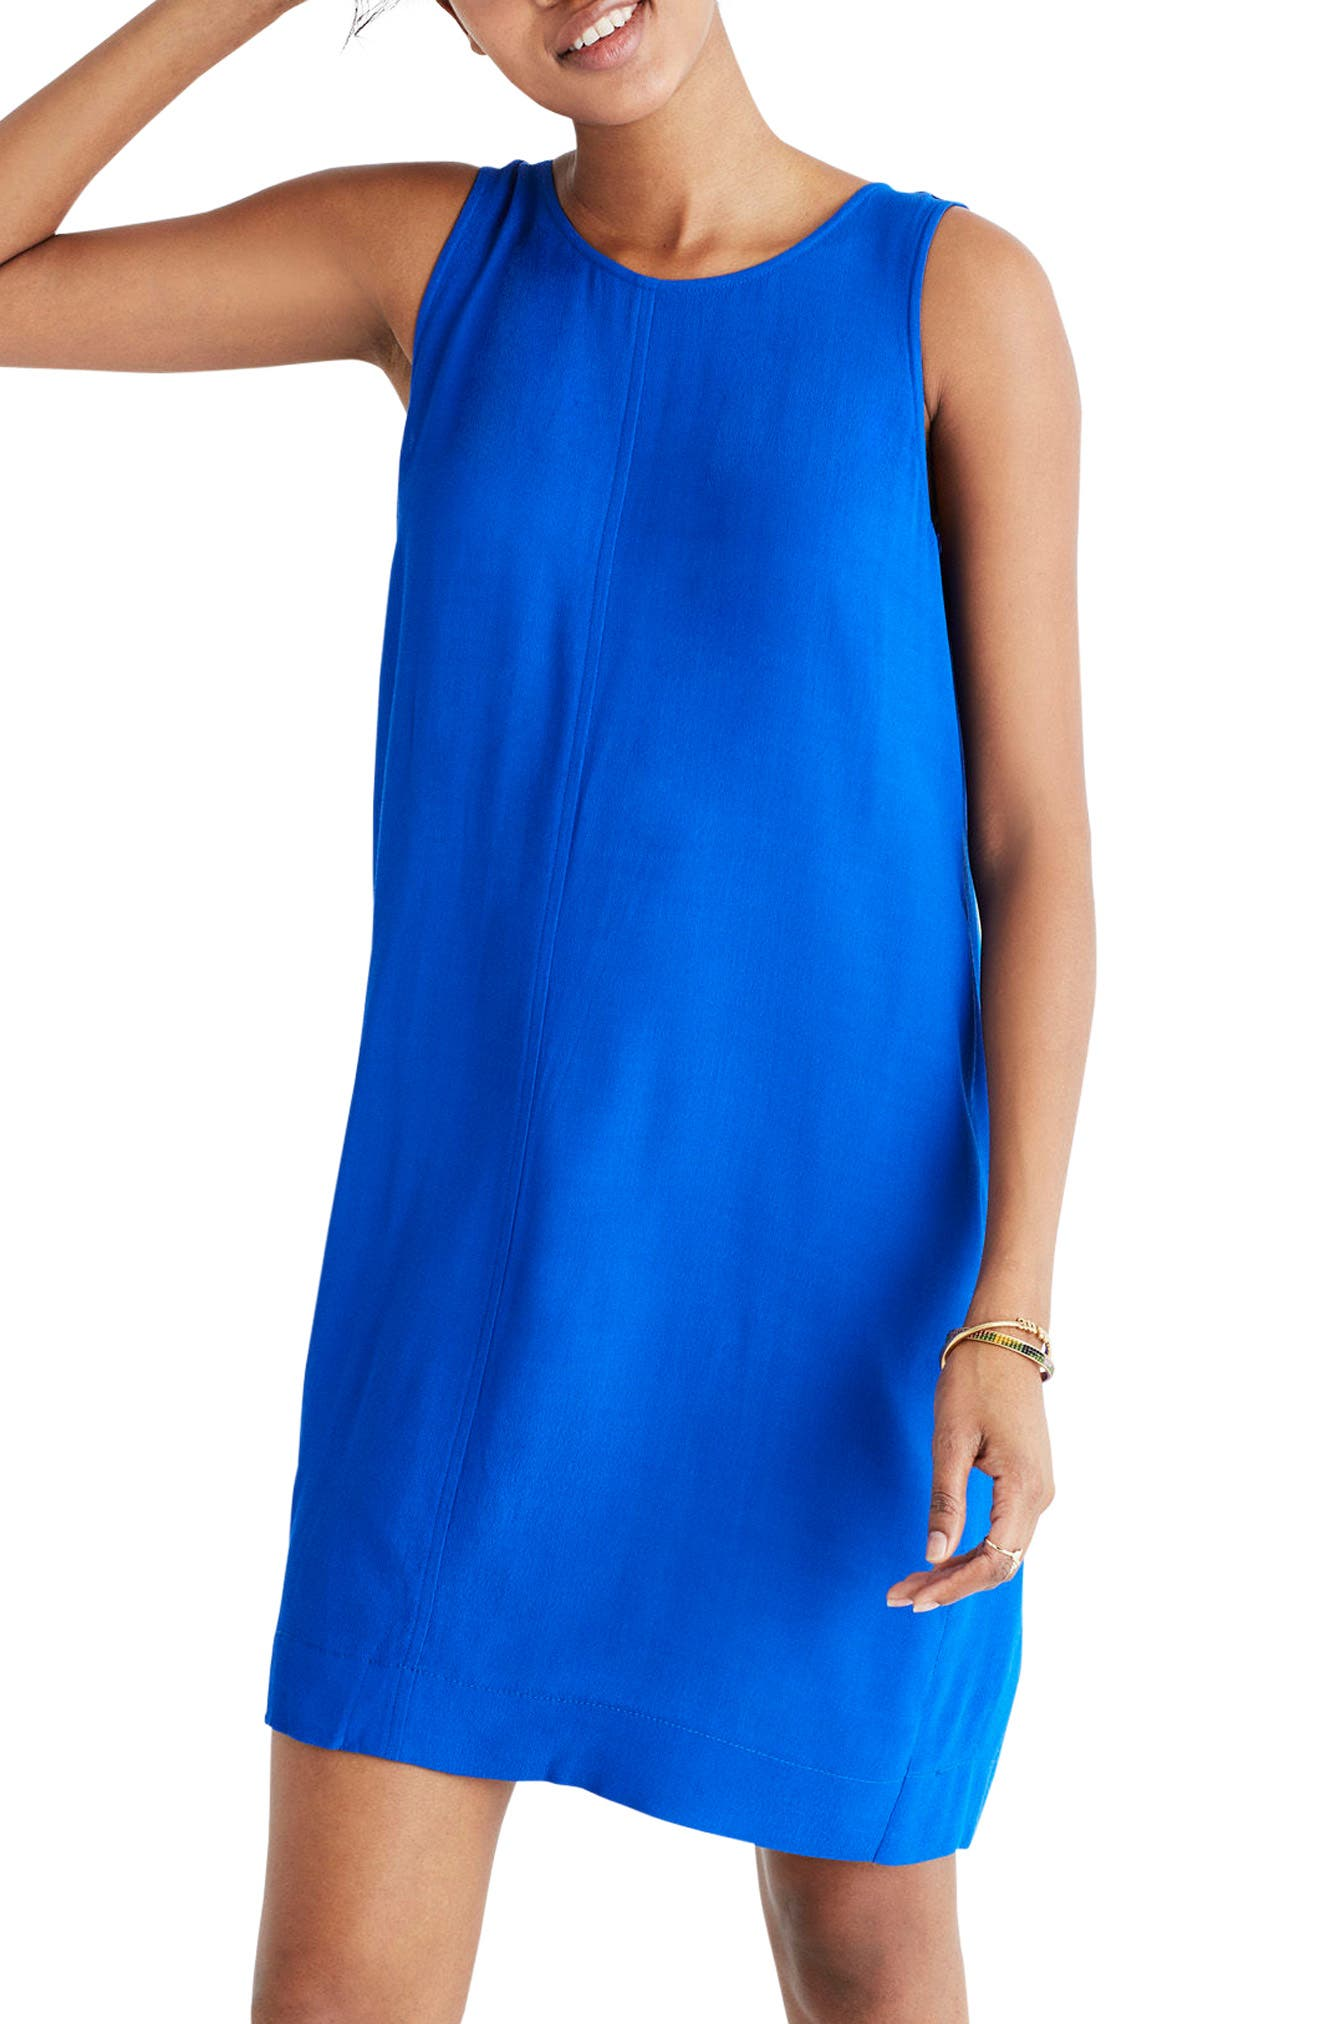 Lakeshore Button Back Dress,                             Main thumbnail 1, color,                             Brilliant Royal